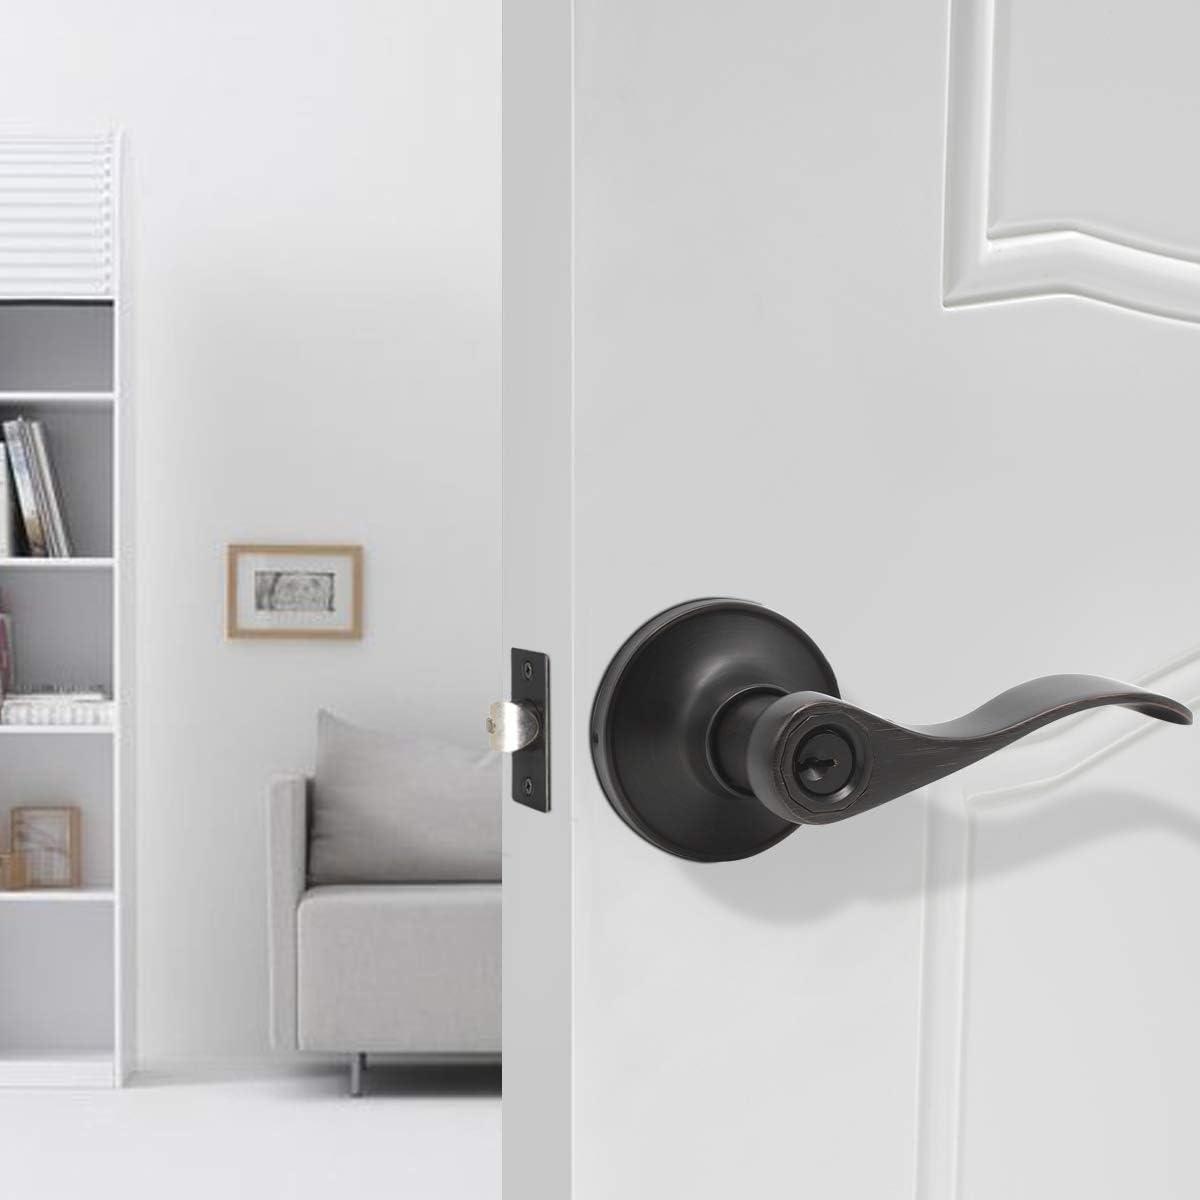 1 Pack Probrico Interior Bedroom Entrance Door Lever Door Lock Hanldeset One Keyway Entry Keyed Alike Same Key Entrance Lockset Oil Rubbed Bronze Each with 3 Keys-Right//Left Handed Reversible